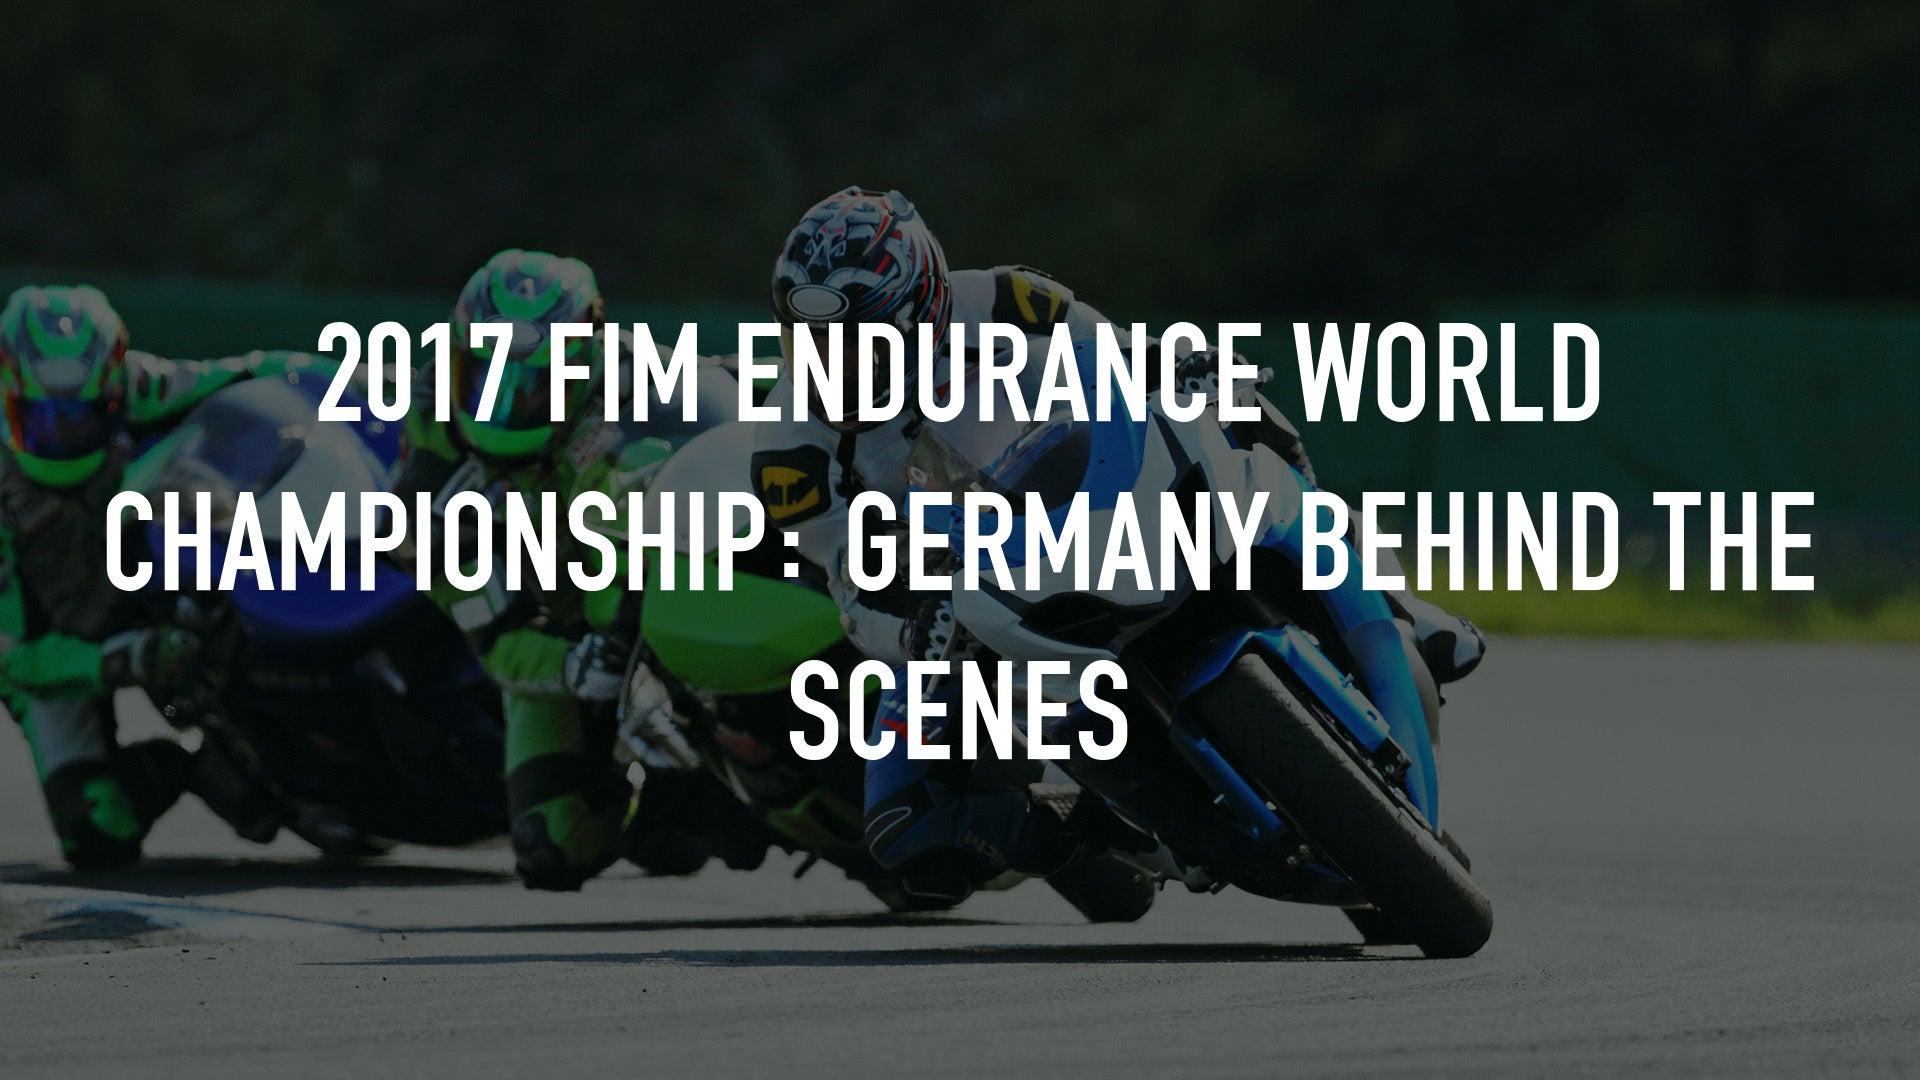 2017 FIM Endurance World Championship: Germany Behind the Scenes